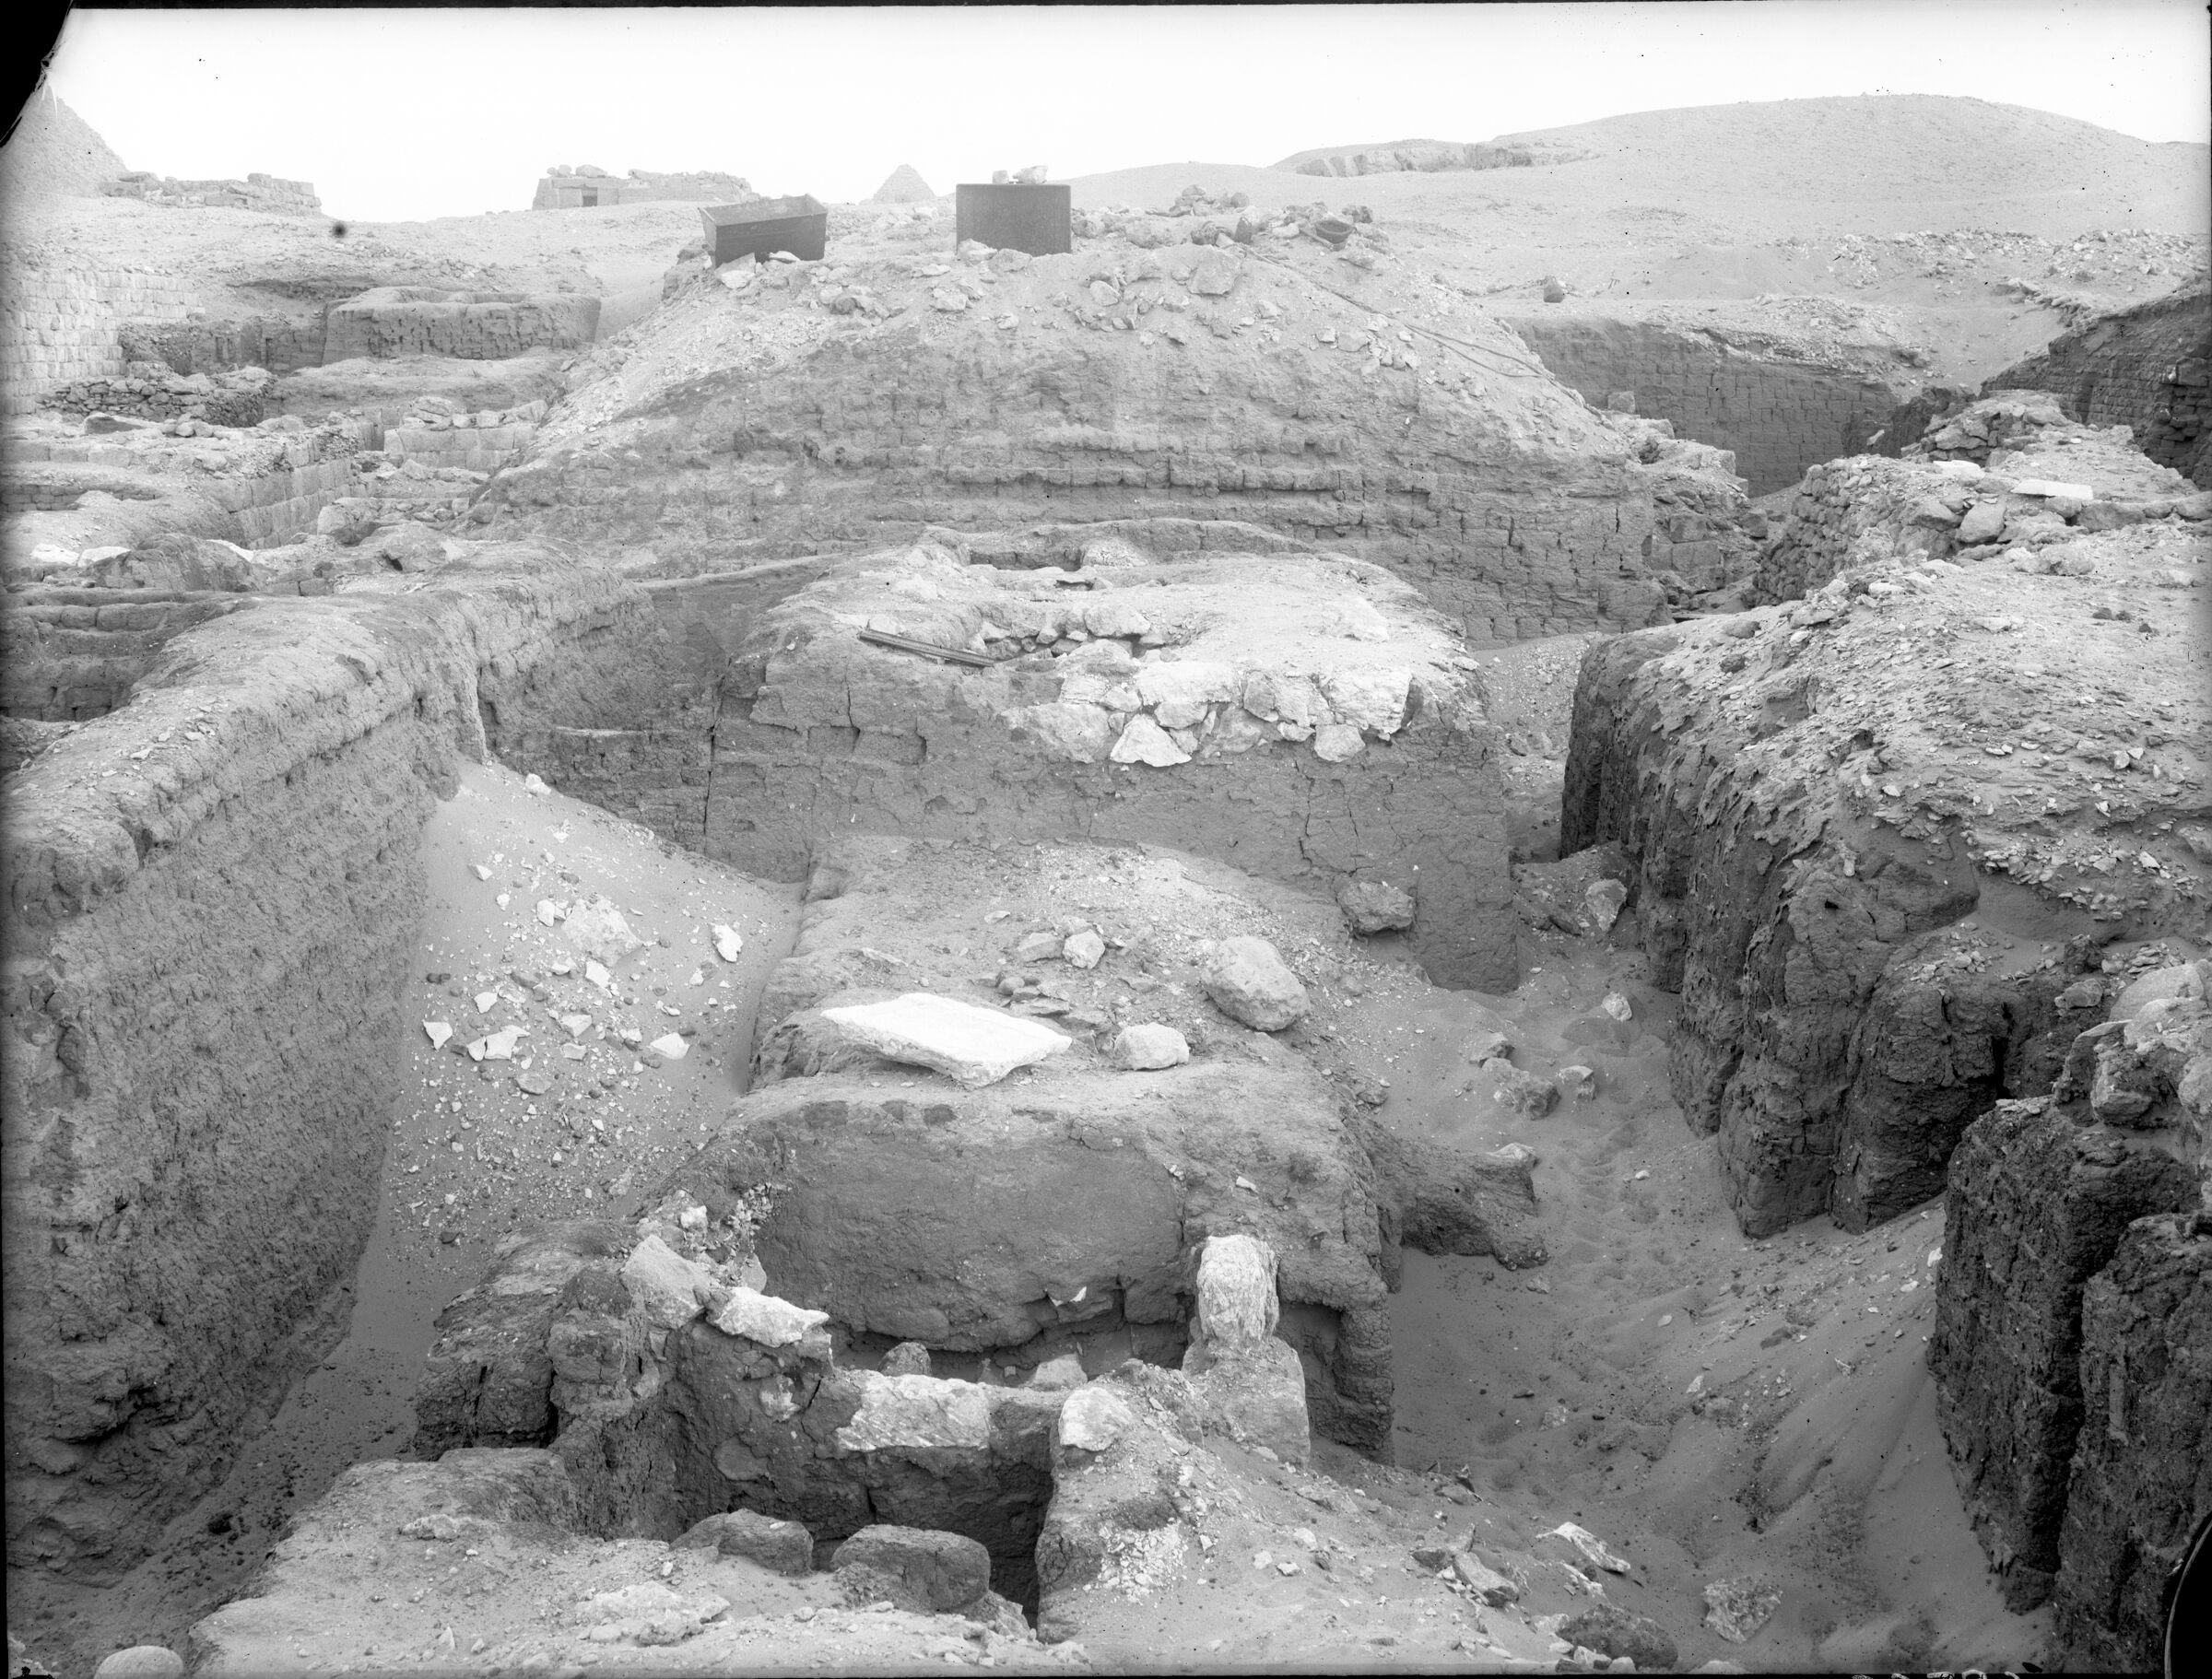 Western Cemetery: Site: Giza; view: Cemetery G 3000, G 3030, G 3036, G 3037